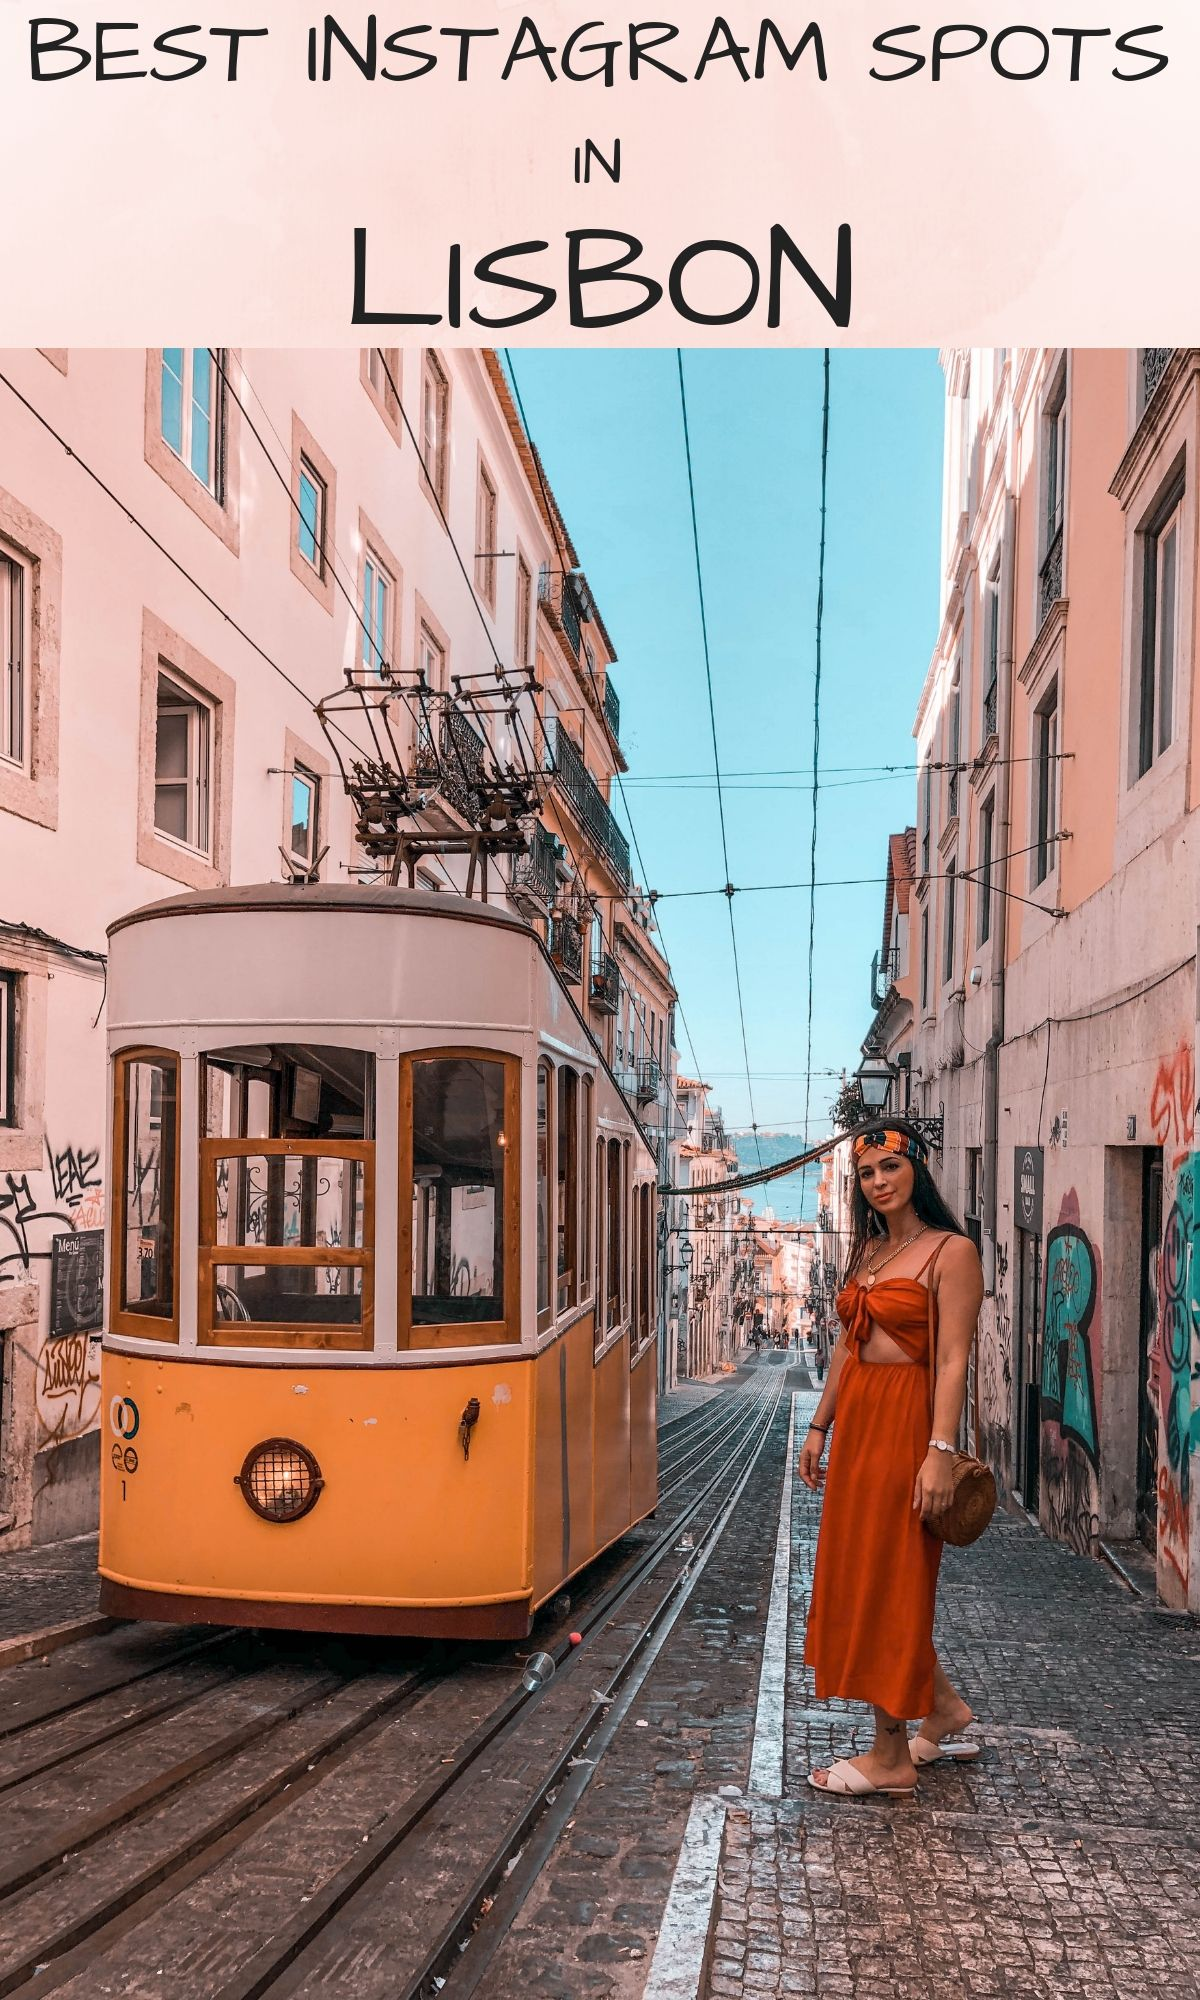 Best Instagram Spots In Lisbon En 2020 Viajes Portugal Viajes Fotos